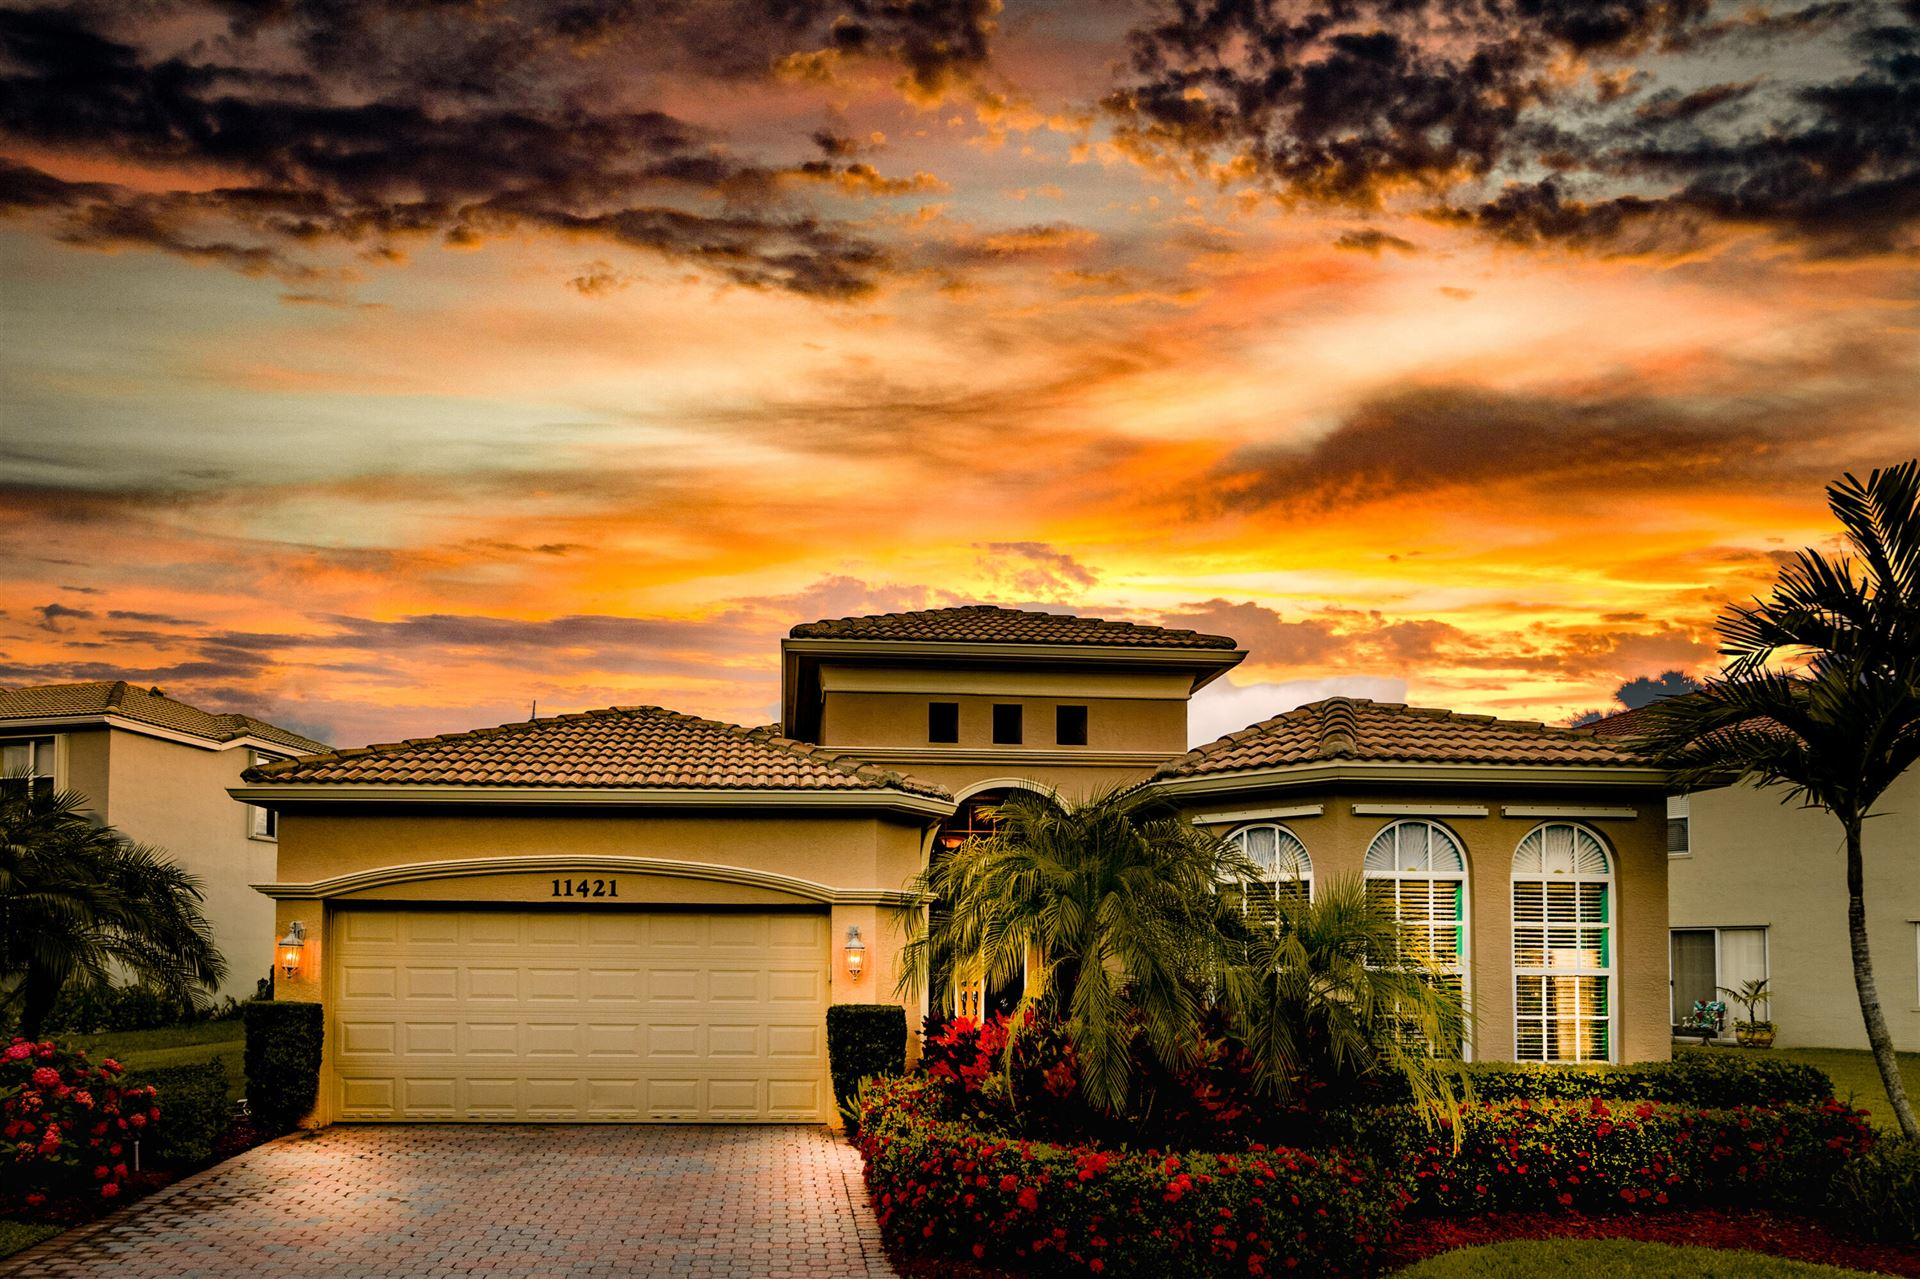 11421 SW Kingslake Circle, Port Saint Lucie, FL 34987 - #: RX-10735487